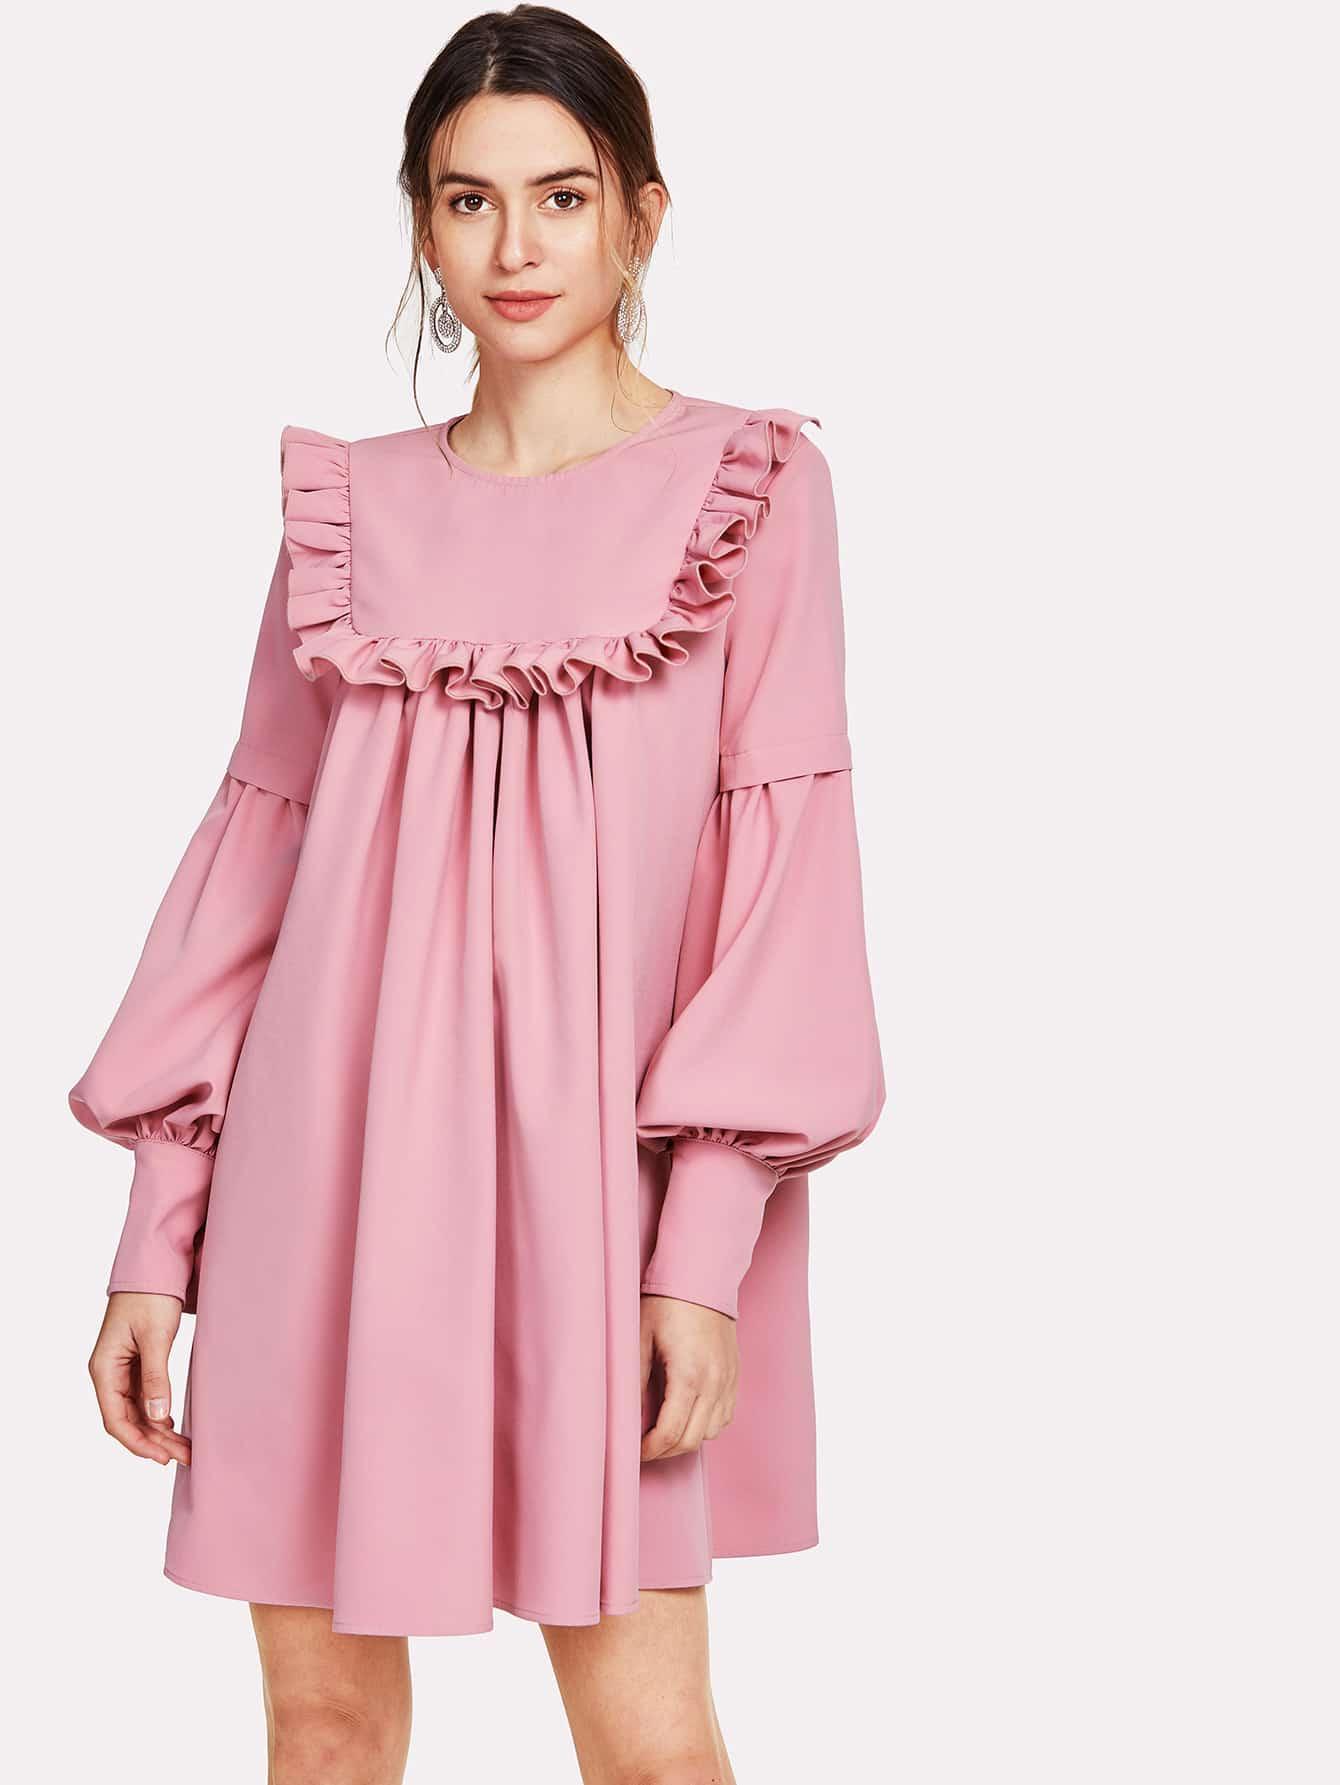 Ruffle Yoke Lantern Sleeve Flowy Dress lantern sleeve ruffle trim pinstripe dress